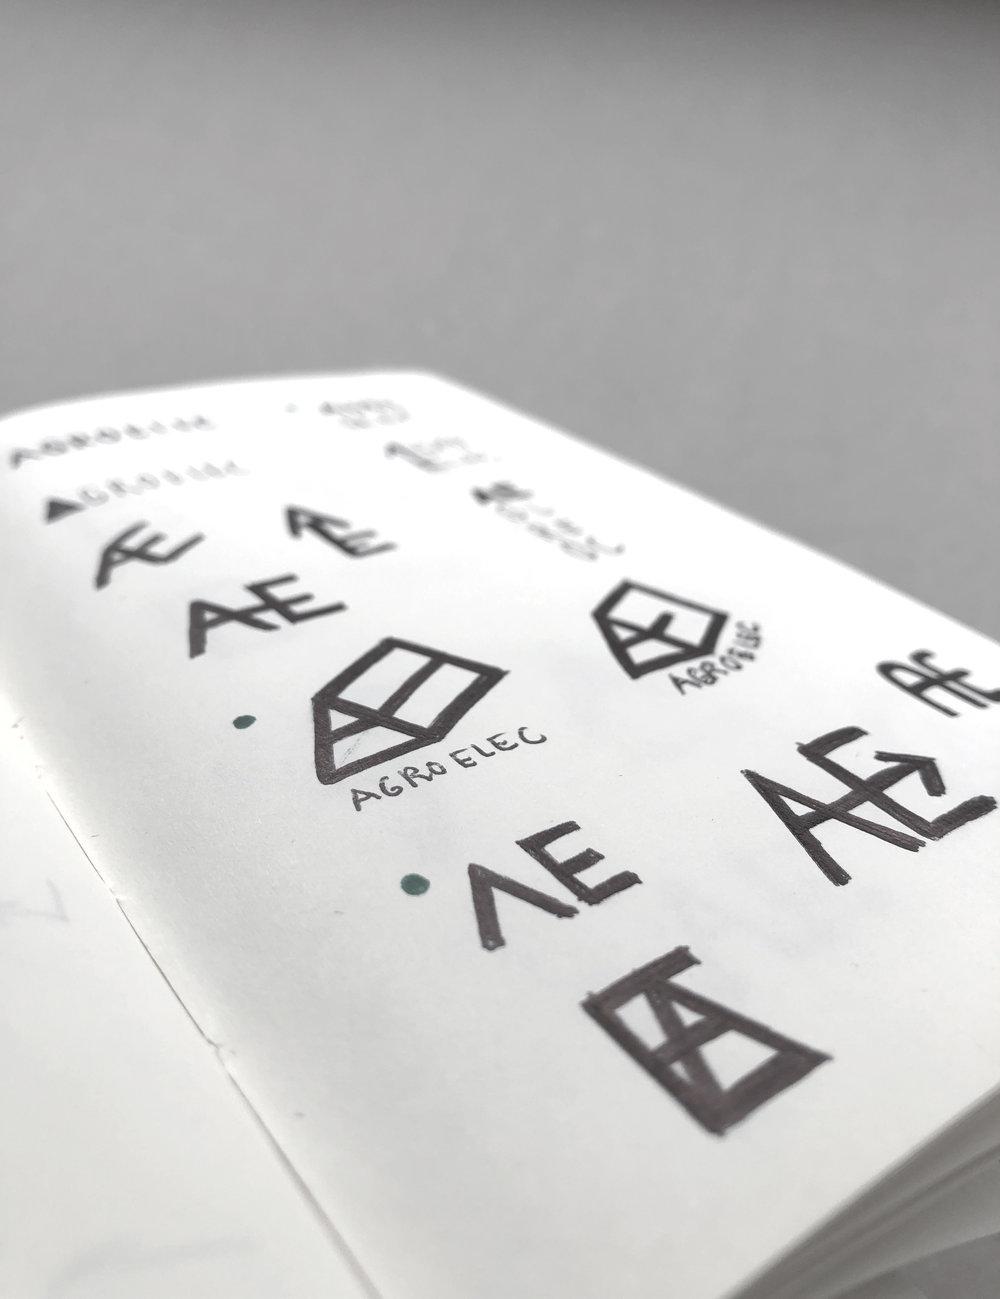 AE_01.jpg